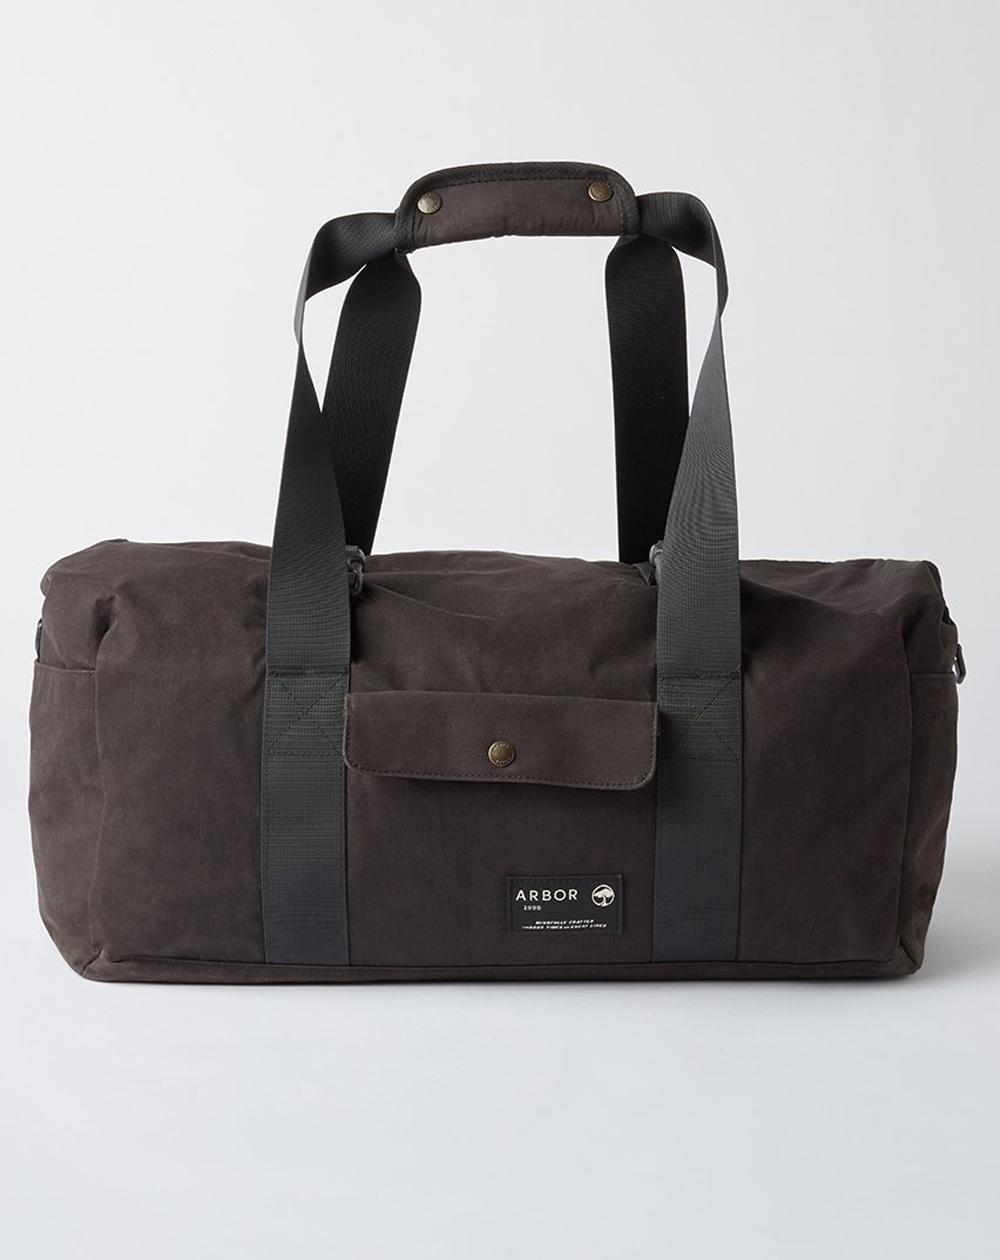 Arbor Sac Up Cargo Vintage Black